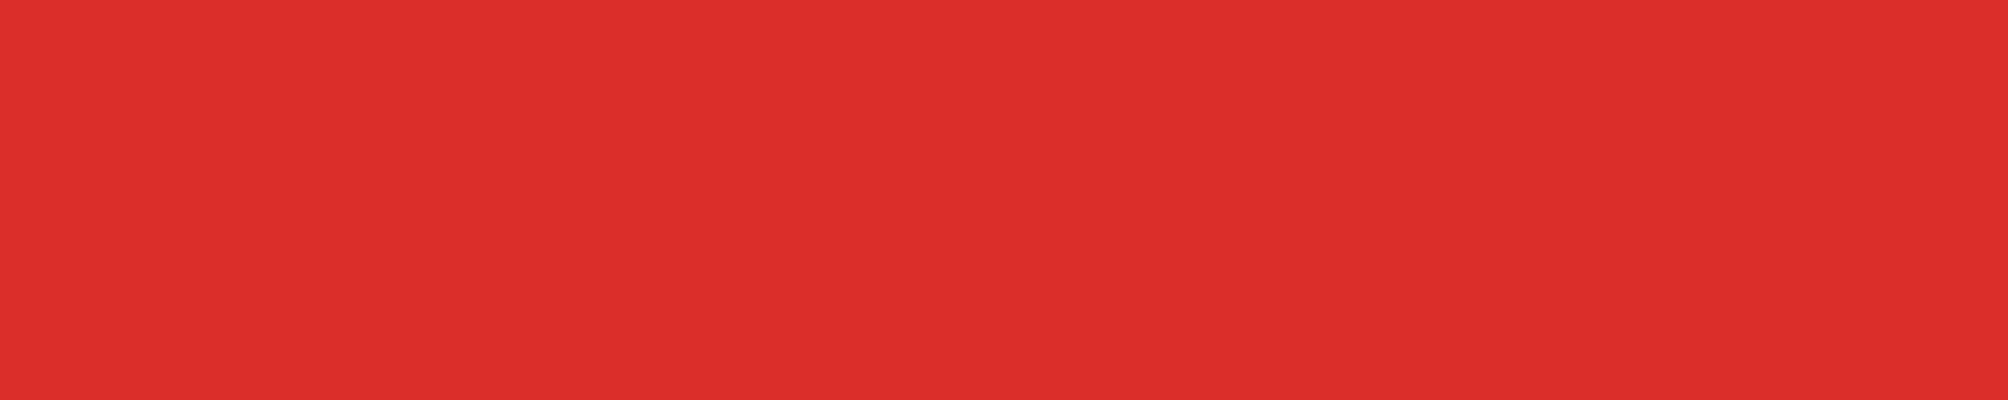 "<span style=""color: #ffffff;"">outlet<br>loisirs</span> - Herobanner - HEMA"